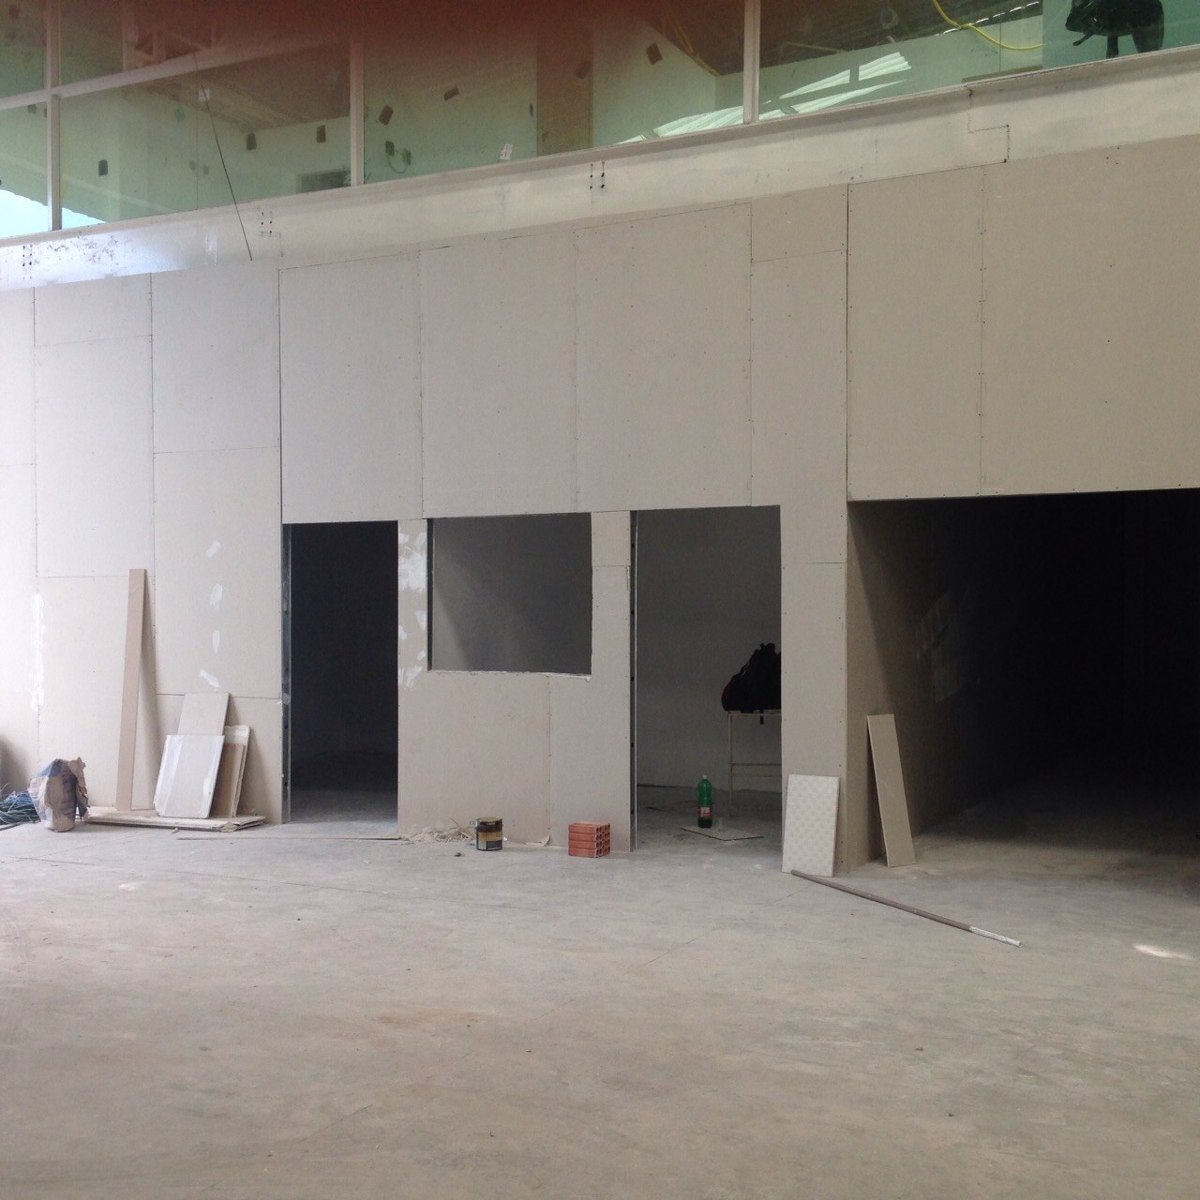 Forro Drywall Rebaixamento Sanca Divisória Gesso R$ 110 00 no  #5C473B 1200 1200